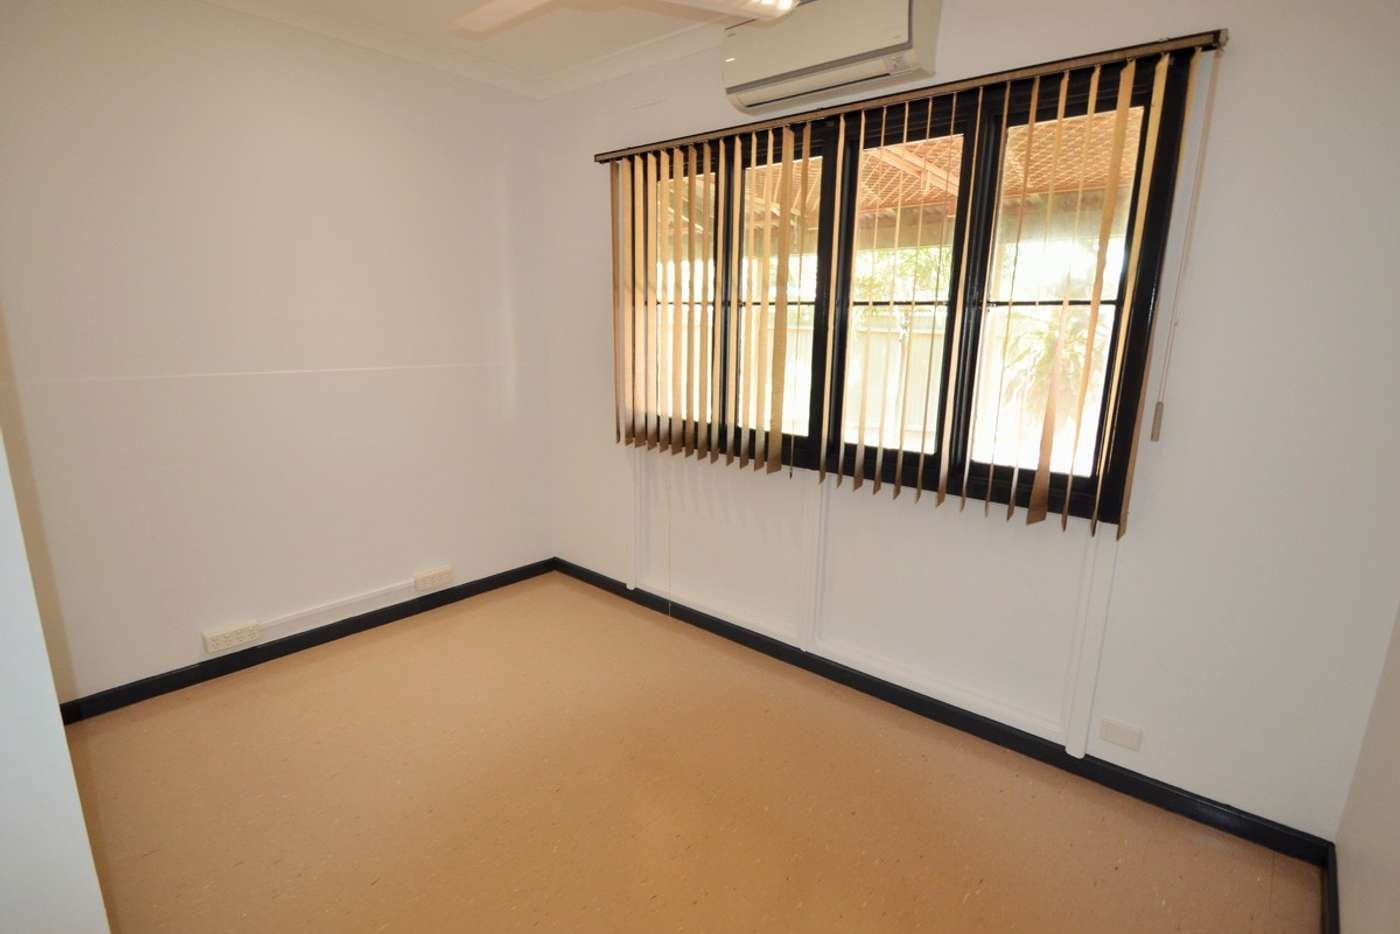 Sixth view of Homely house listing, 11 Pedlar Street, South Hedland WA 6722